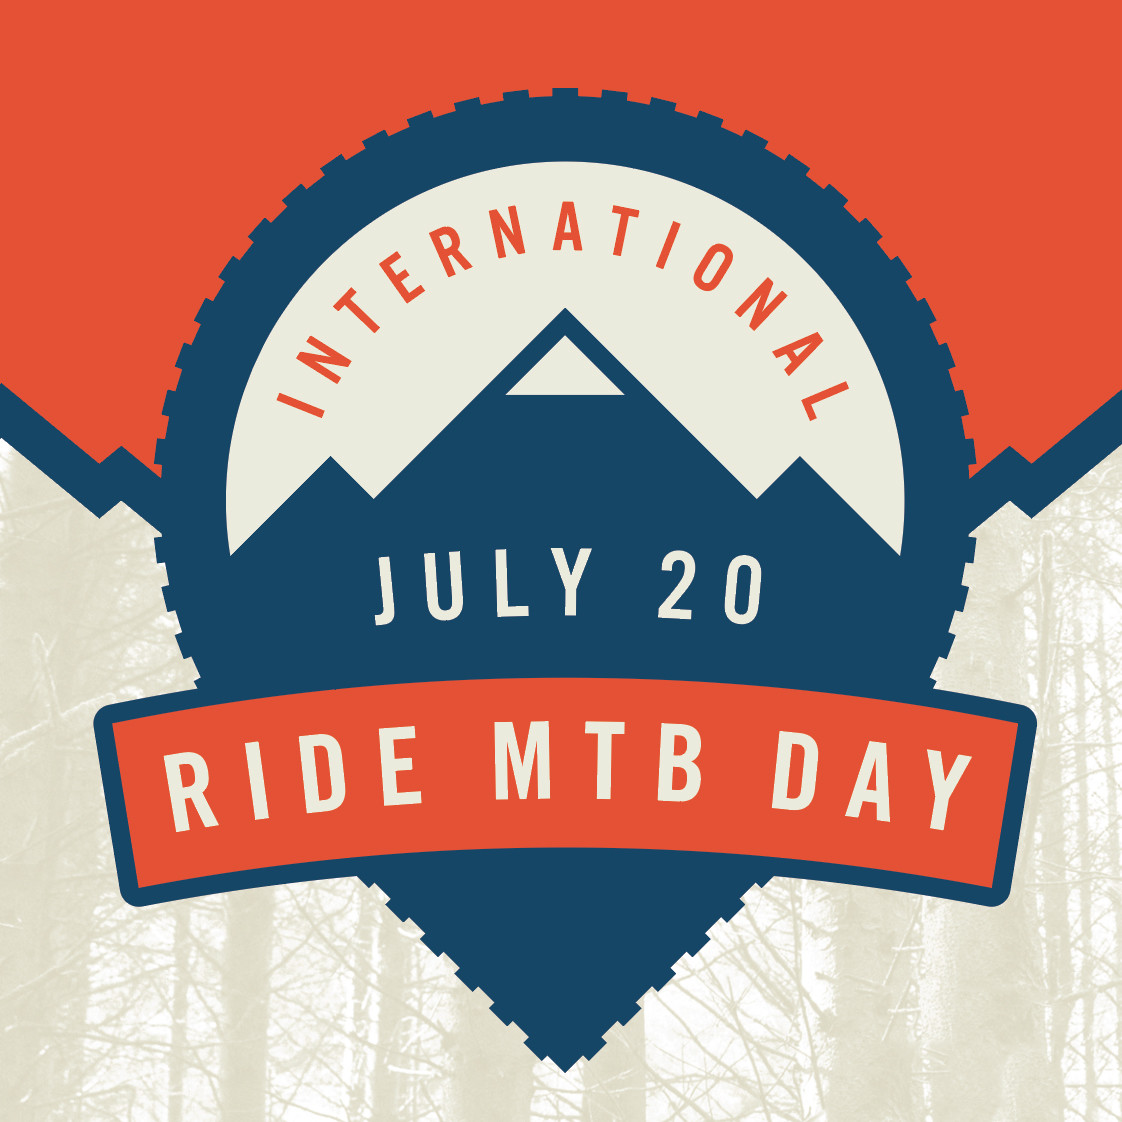 Fox Racing Supports International Ride Mountain Bike Day #RIDEMTBDAY